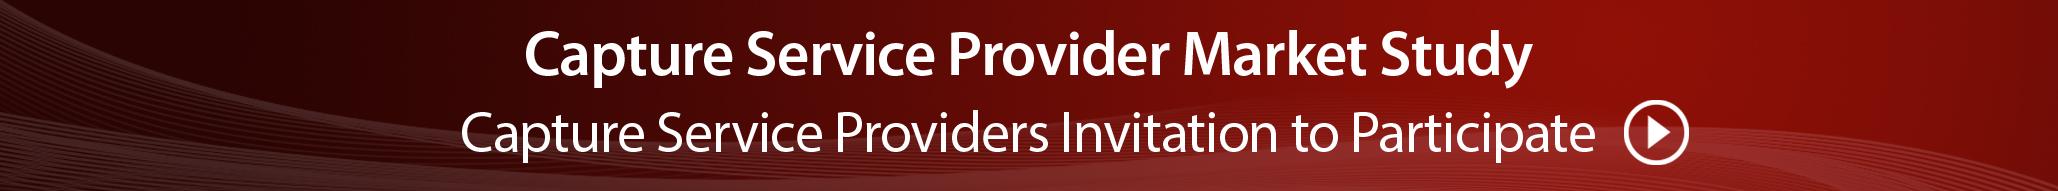 capture-service-provider-market-study-banner